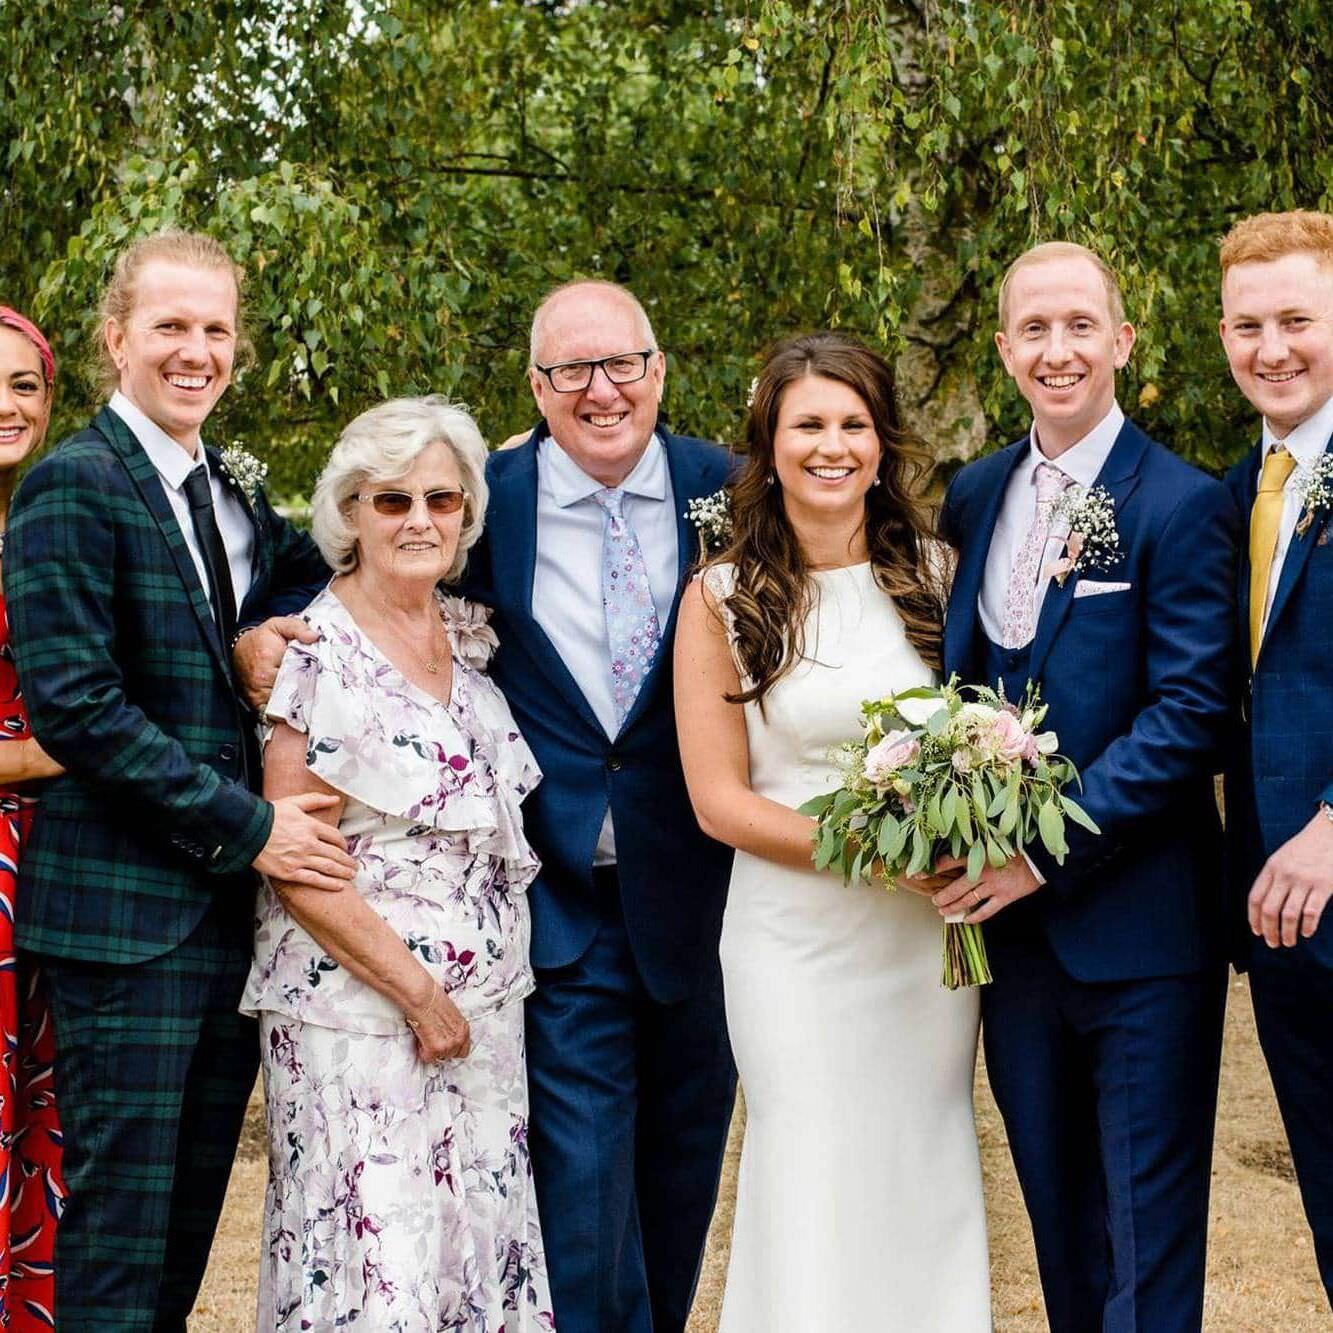 mark-seymour-wedding-photographer-bio 5